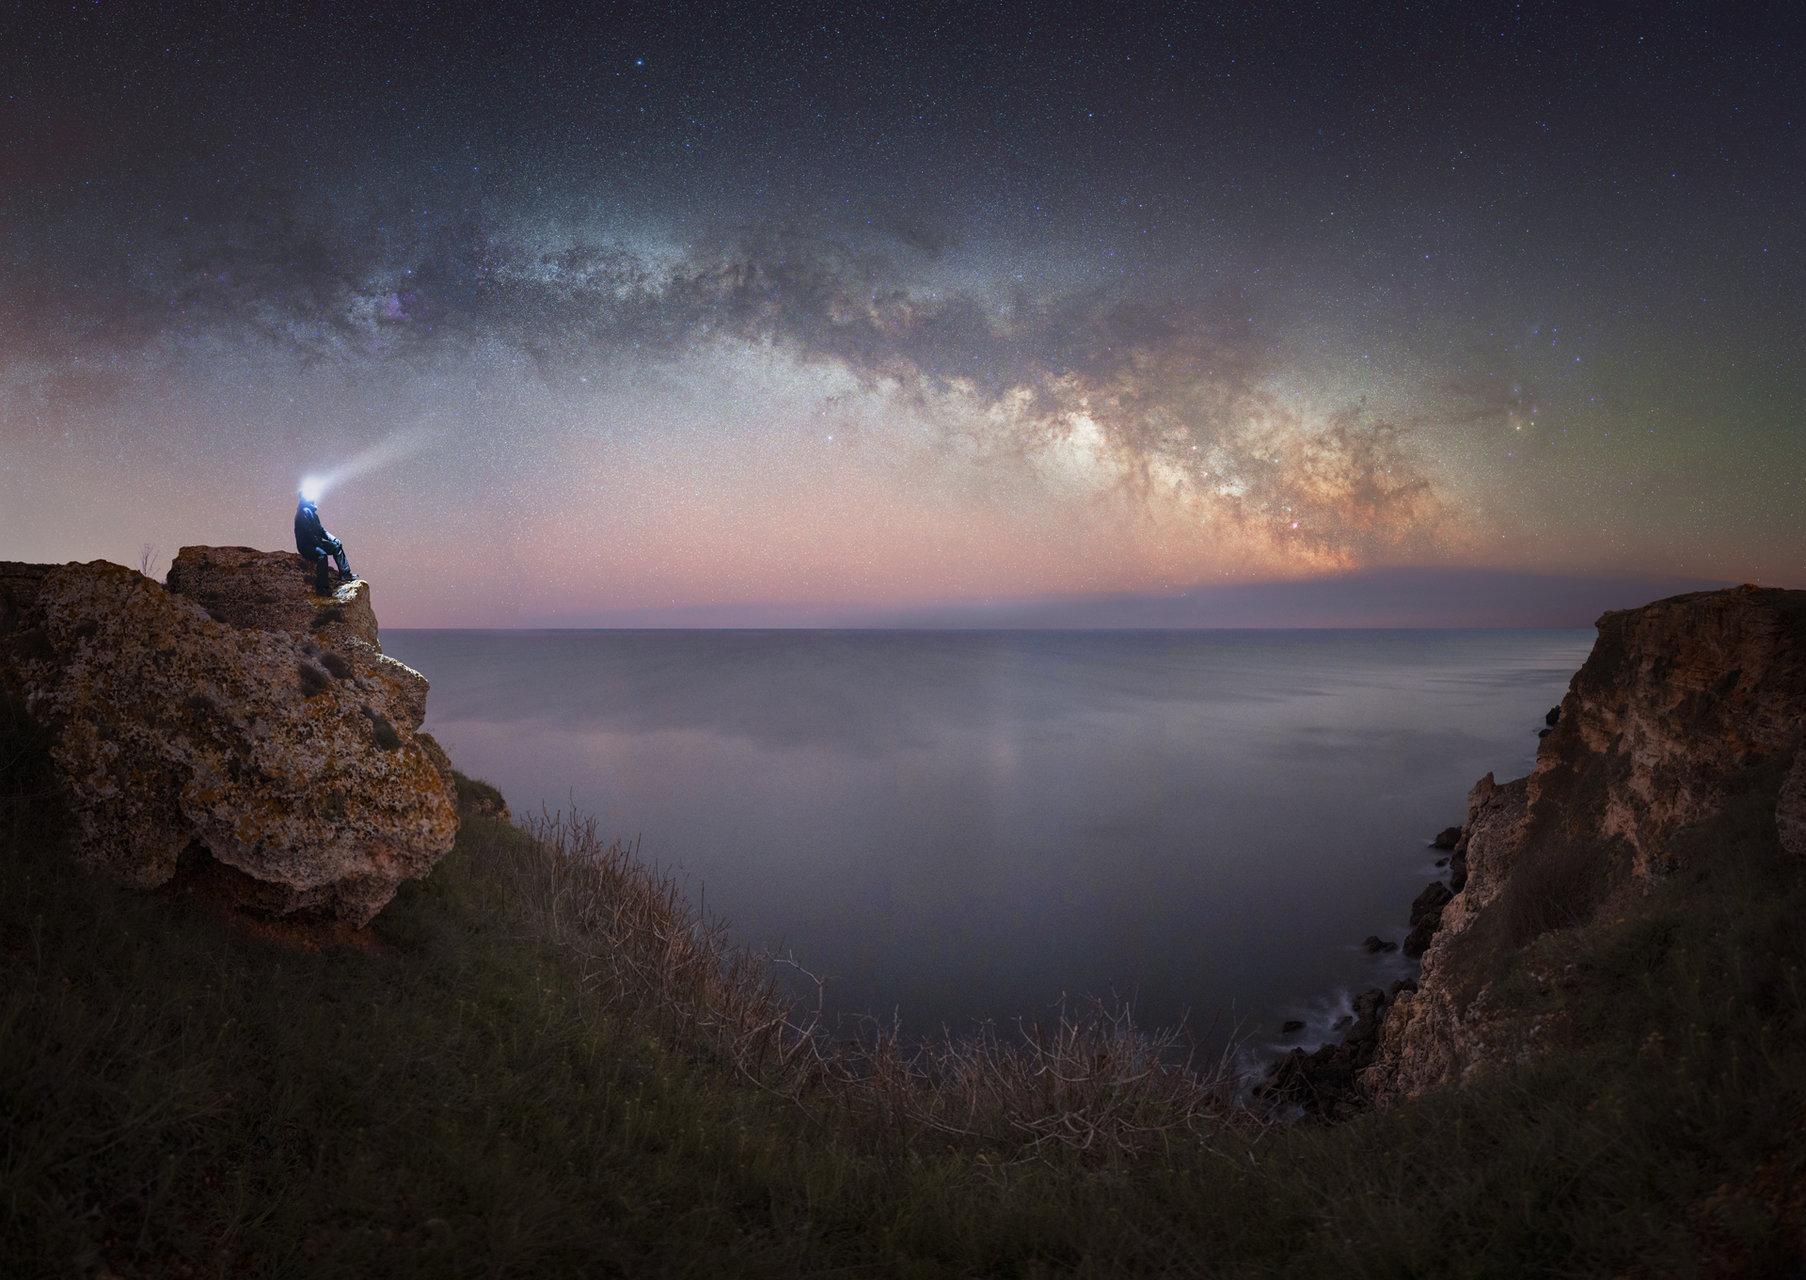 Някъде из Камен бряг през Април   Author Mihail Minkov - takama   PHOTO FORUM